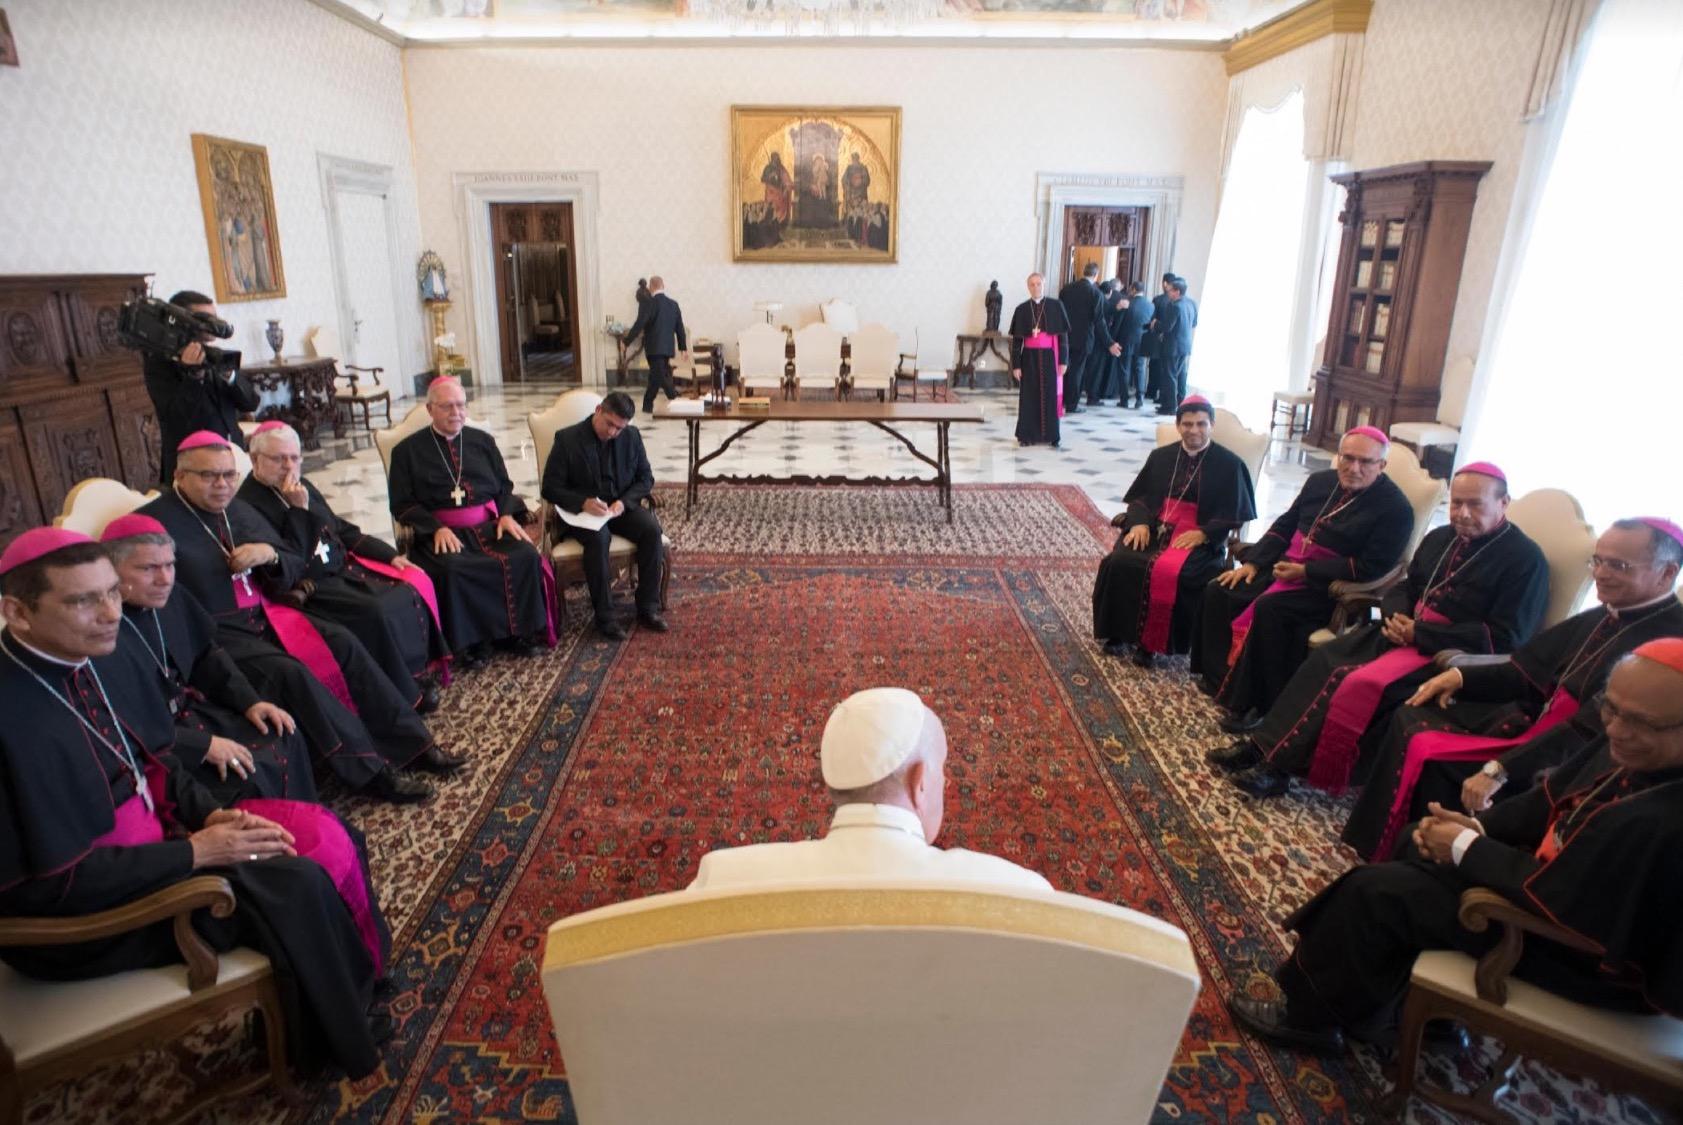 Obispos de Nicaragua en Visita ad Limina © L´Osservatore Romano